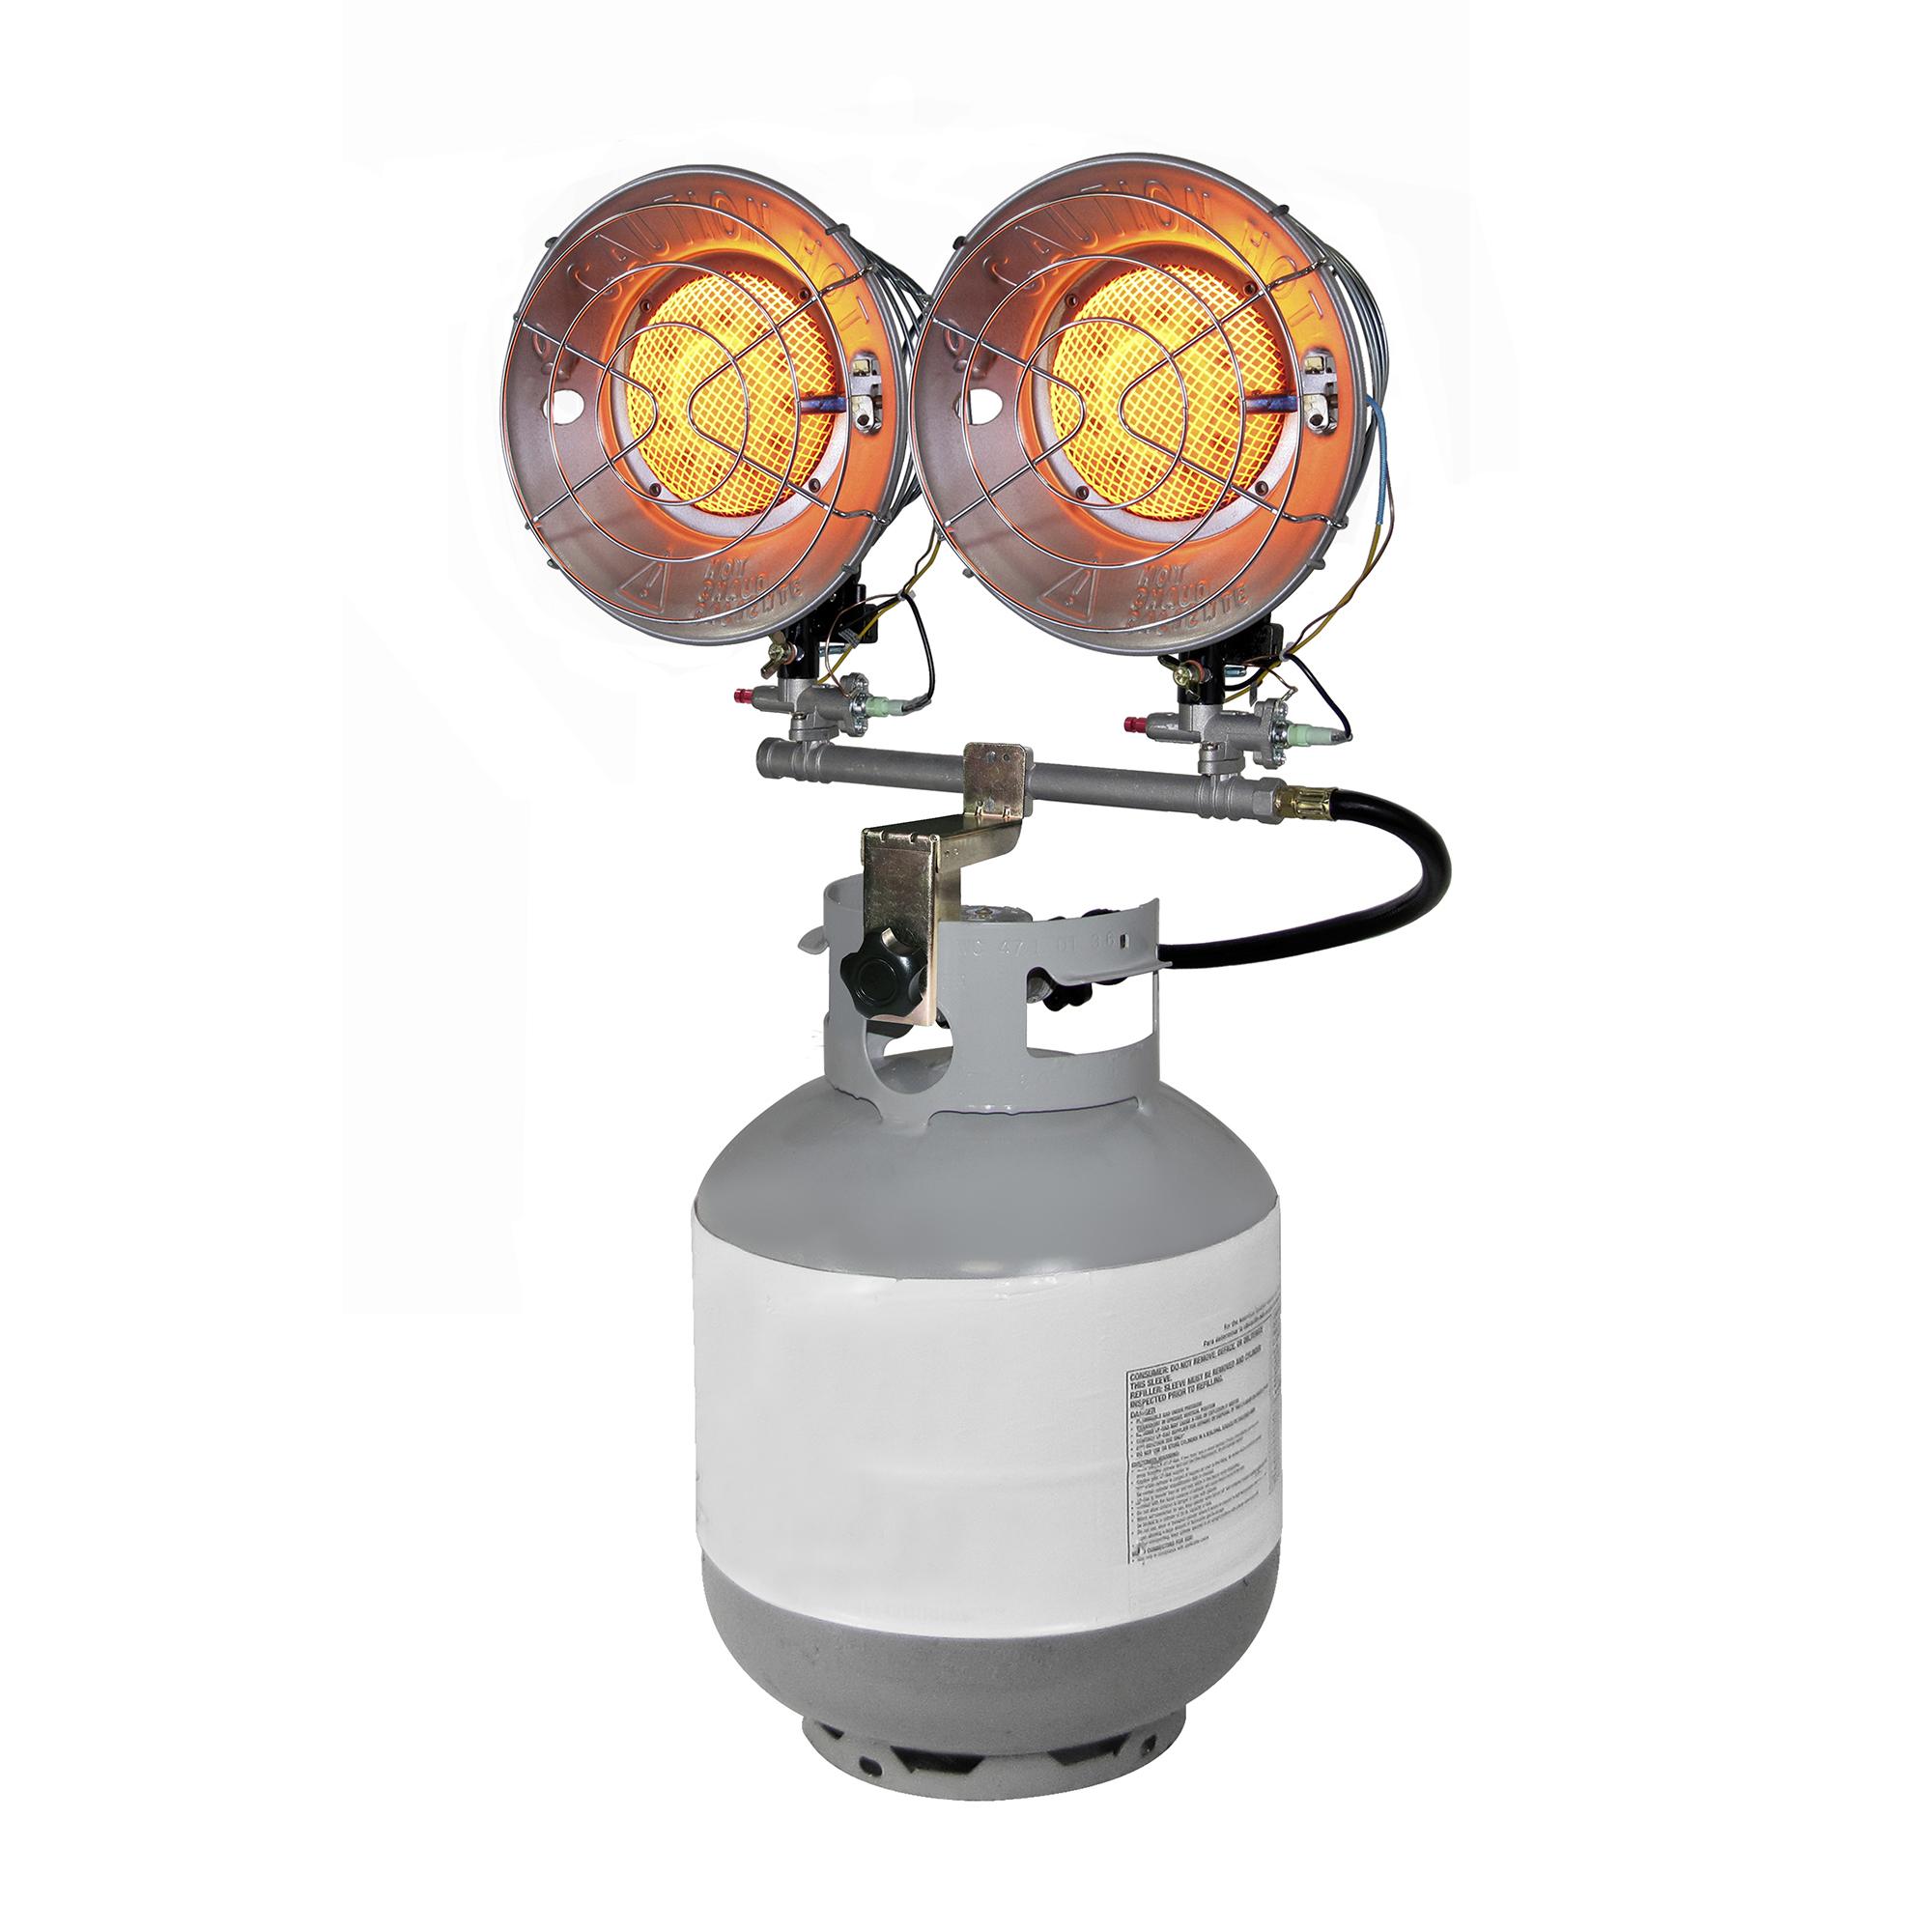 Dyna-Glo TT30CDGP 30,000 LP Tank Top Heater - CSA